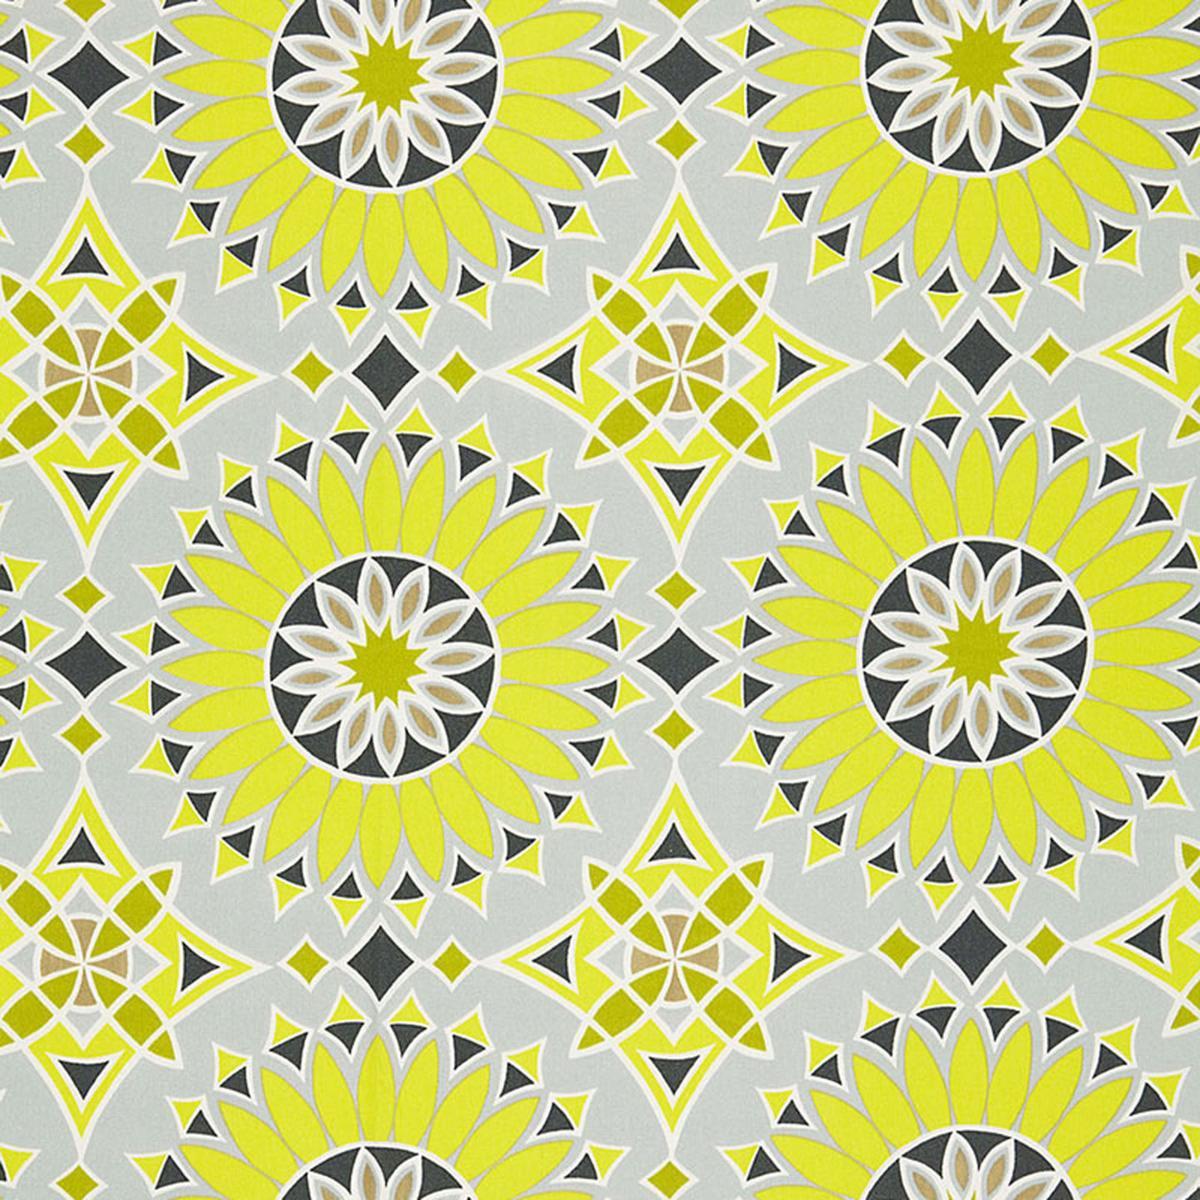 SOLEIL L.A. PRINT indoor outdoor fabrich schumacher.jpg